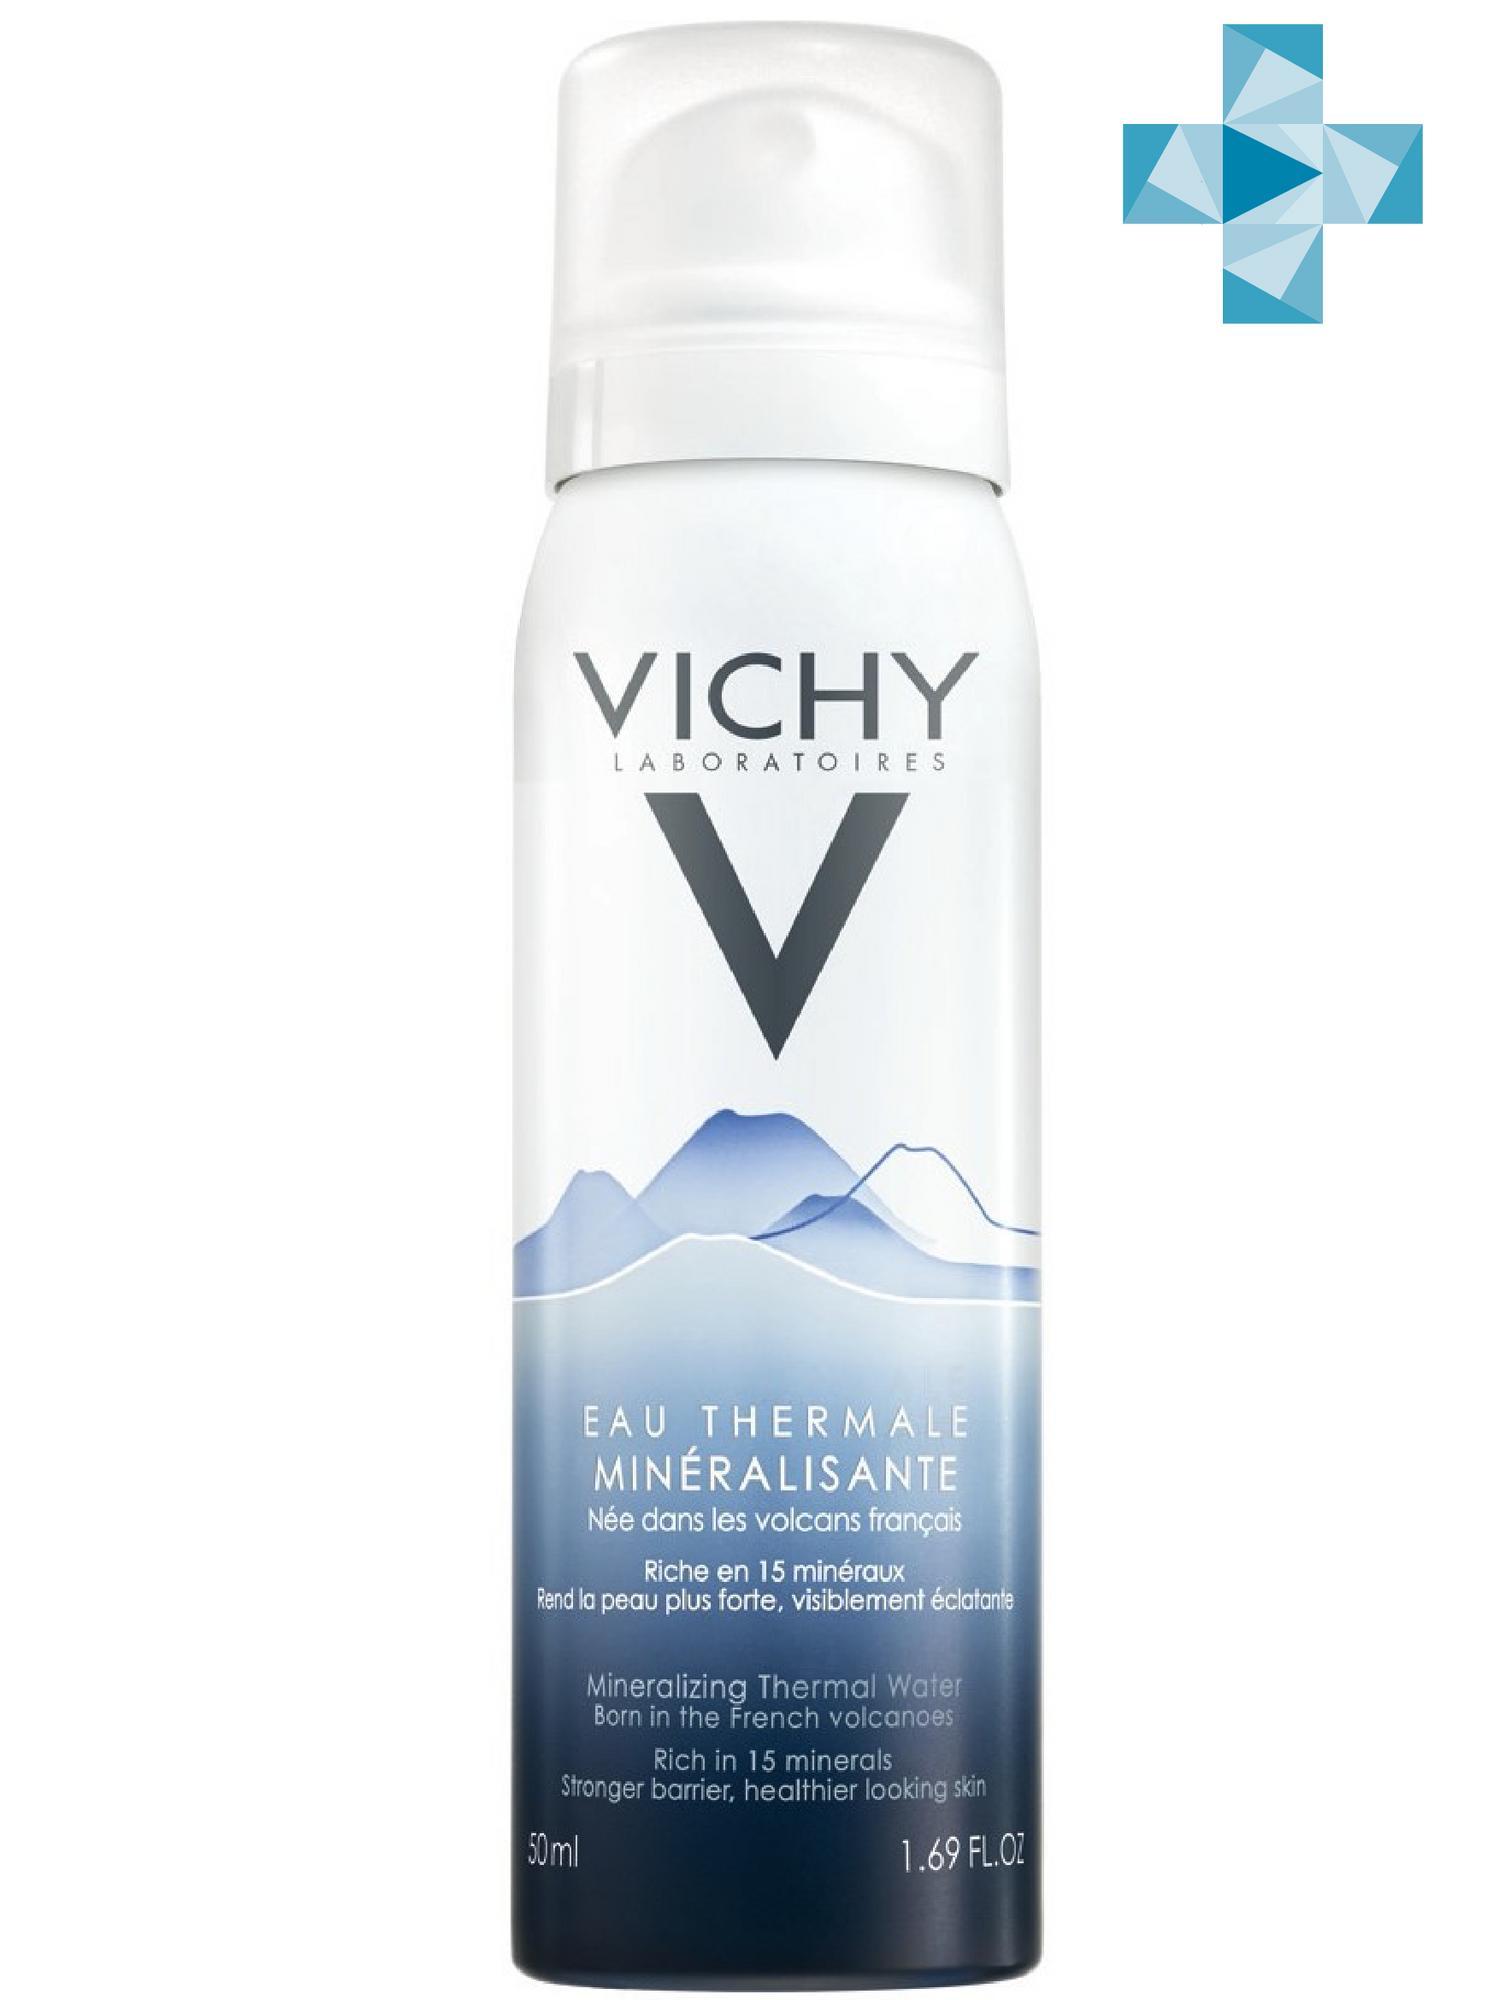 Vichy Термальная Вода Vichy Спа 50 мл (Vichy, Thermal Water Vichy) vichy 50ml